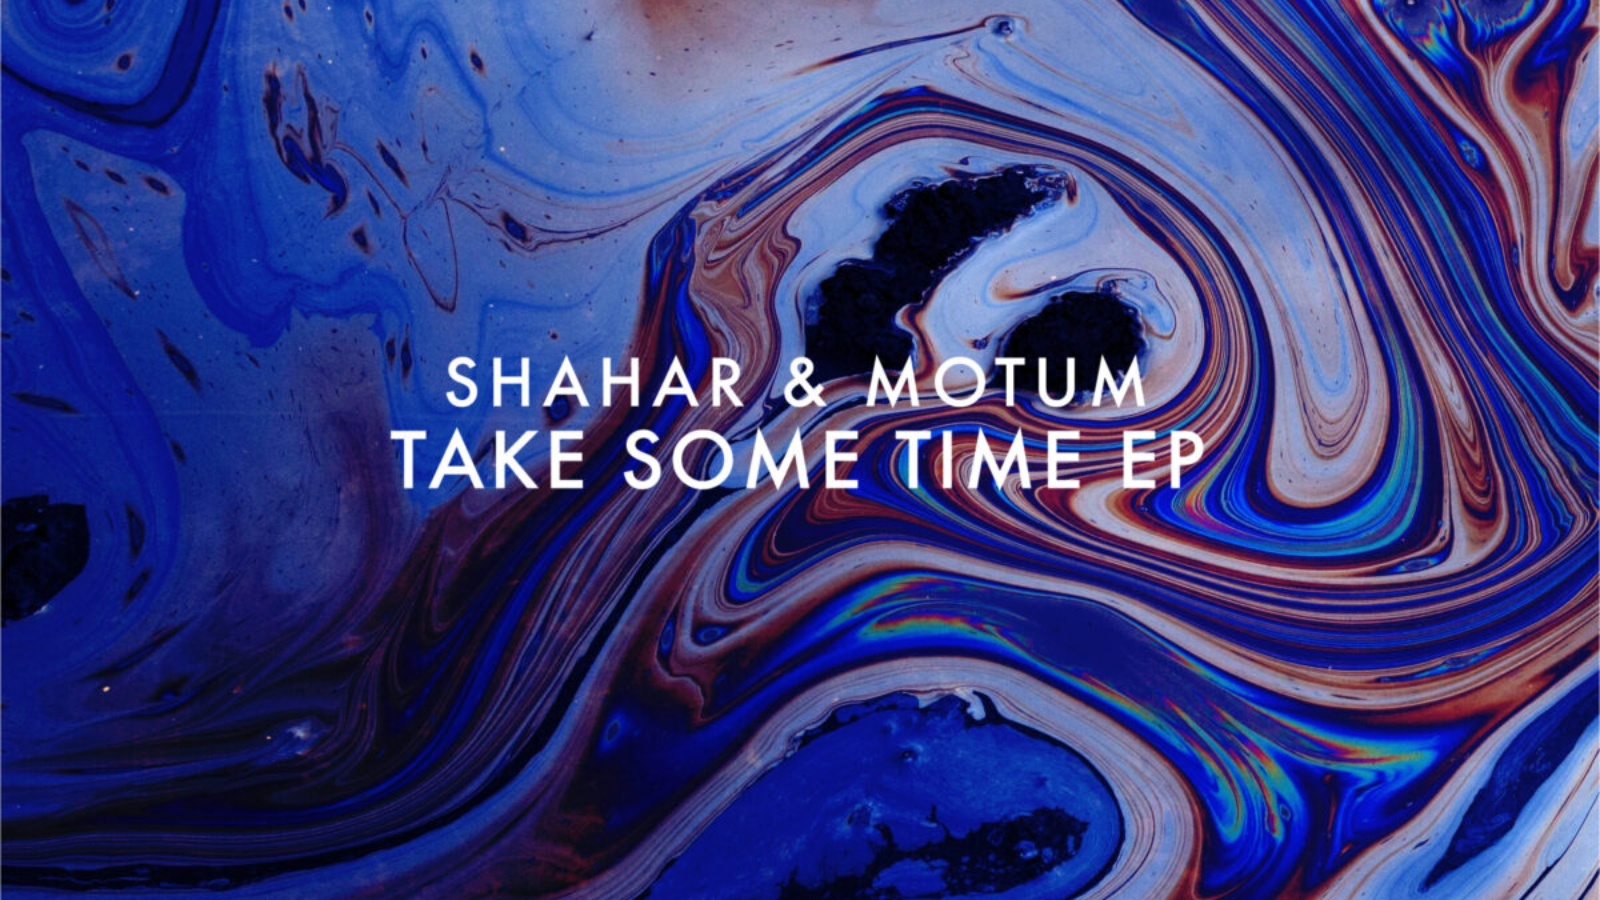 PACKSHOT Shahar & Motum - Take Some Time EP - VIVa MUSiC